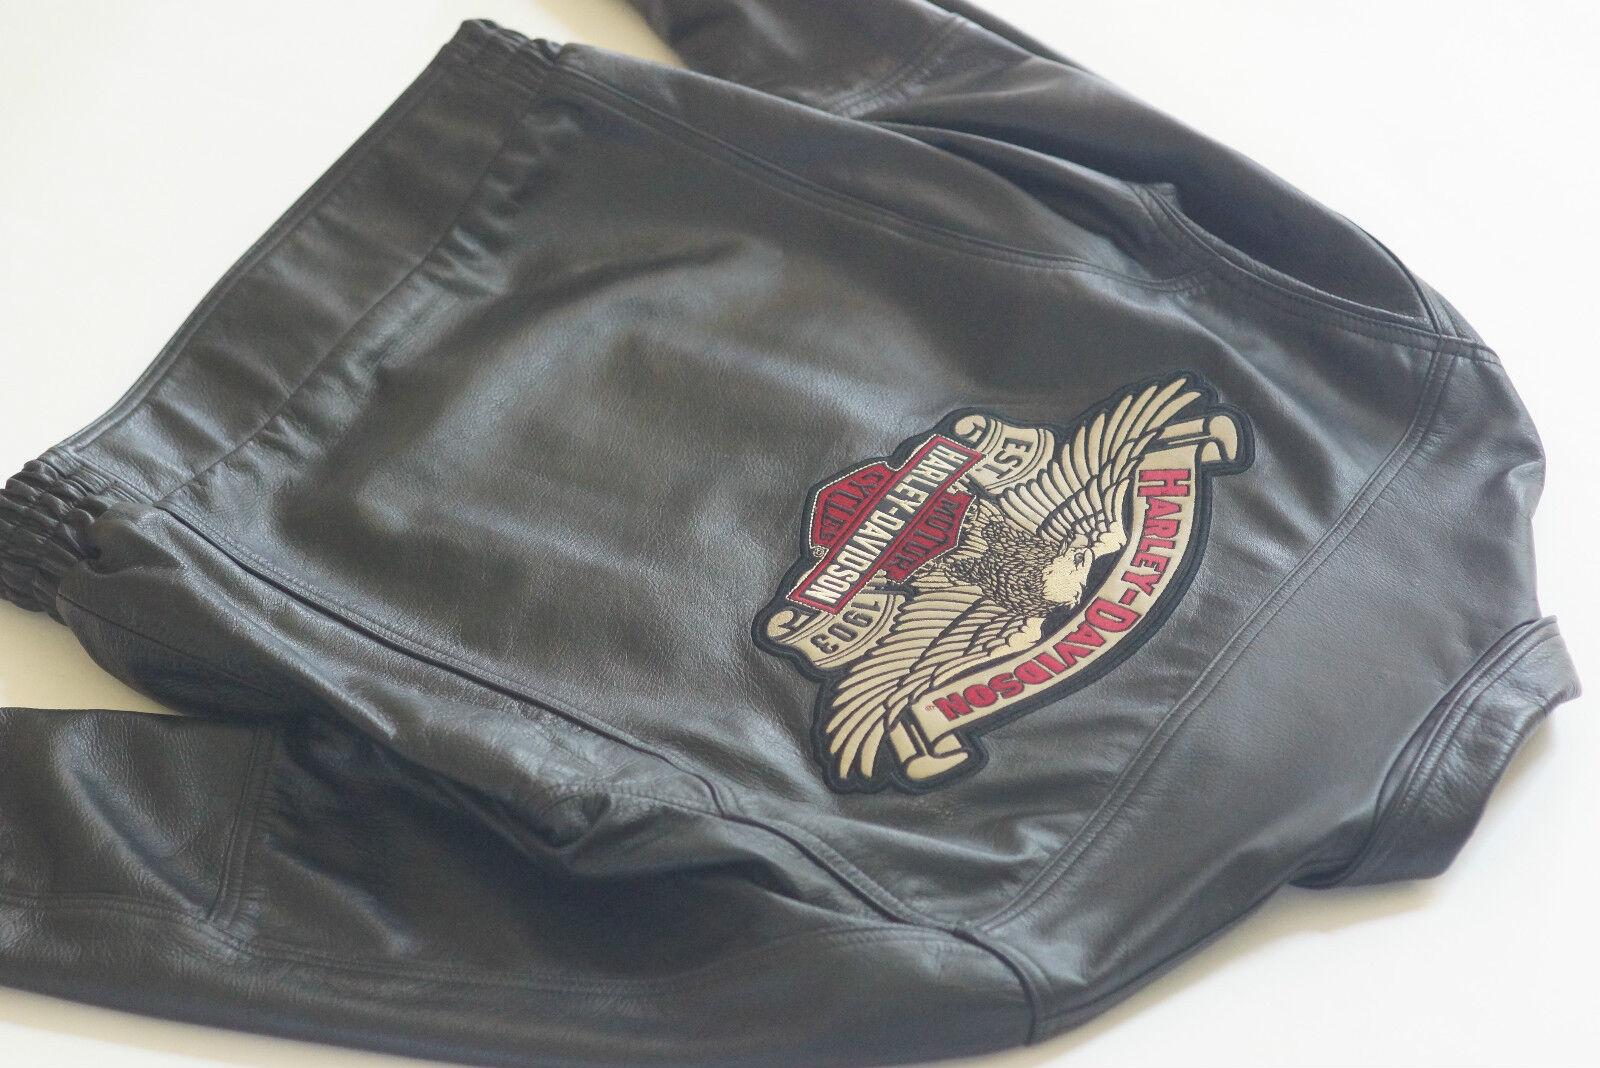 Harley Davidson Uomo Made in USA Aquila Nera Overdrive Giacca pelle Nera Aquila S 97024-05VM 3a1ffa